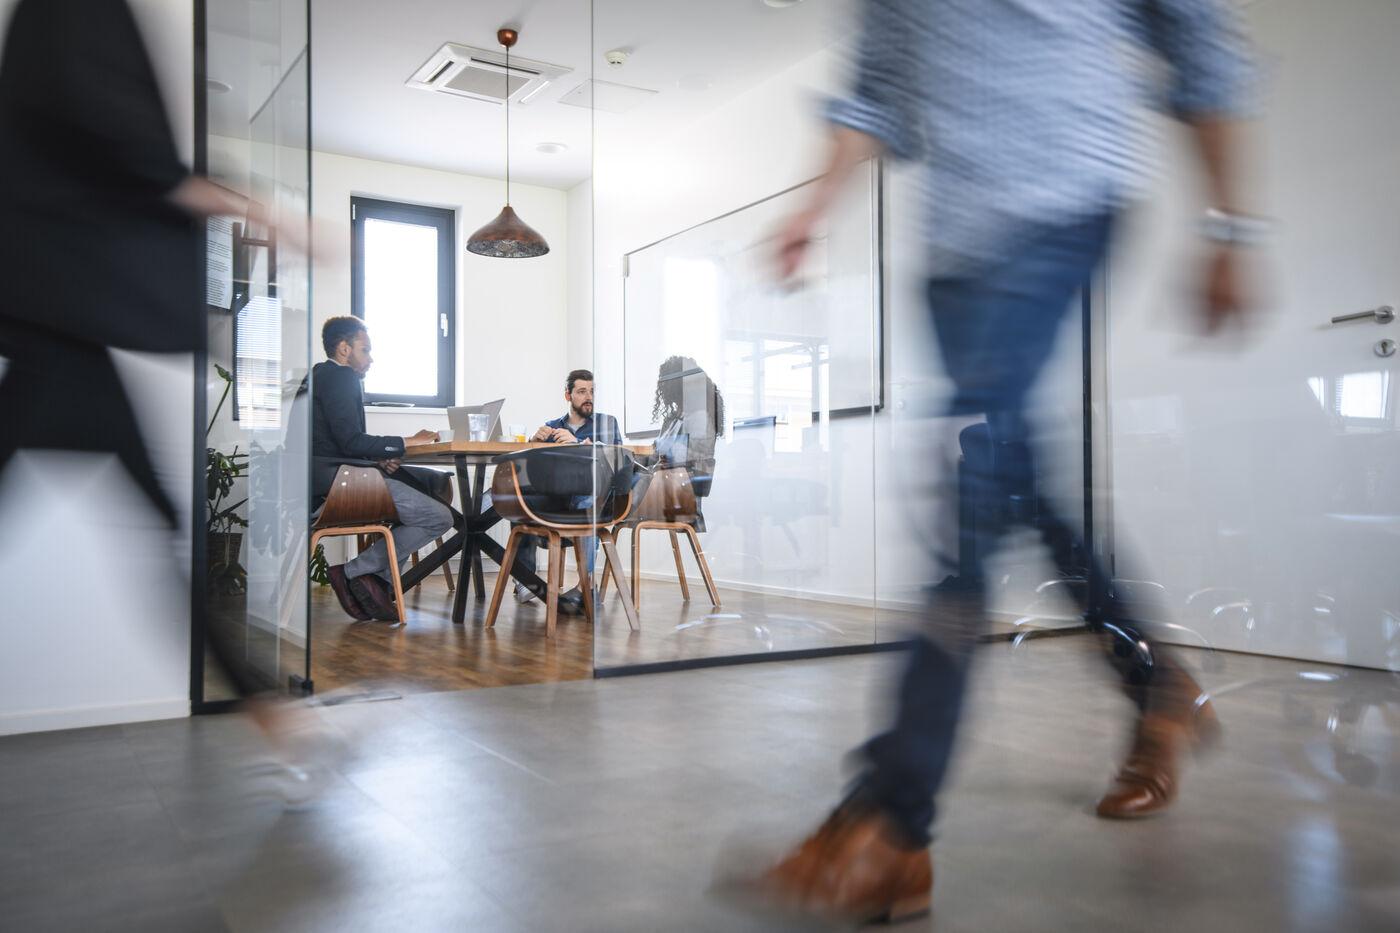 Projektmanager Unternehmensentwicklung (m/w/d) - Job Heidelberg, Homeoffice - Jobs bei Discovergy